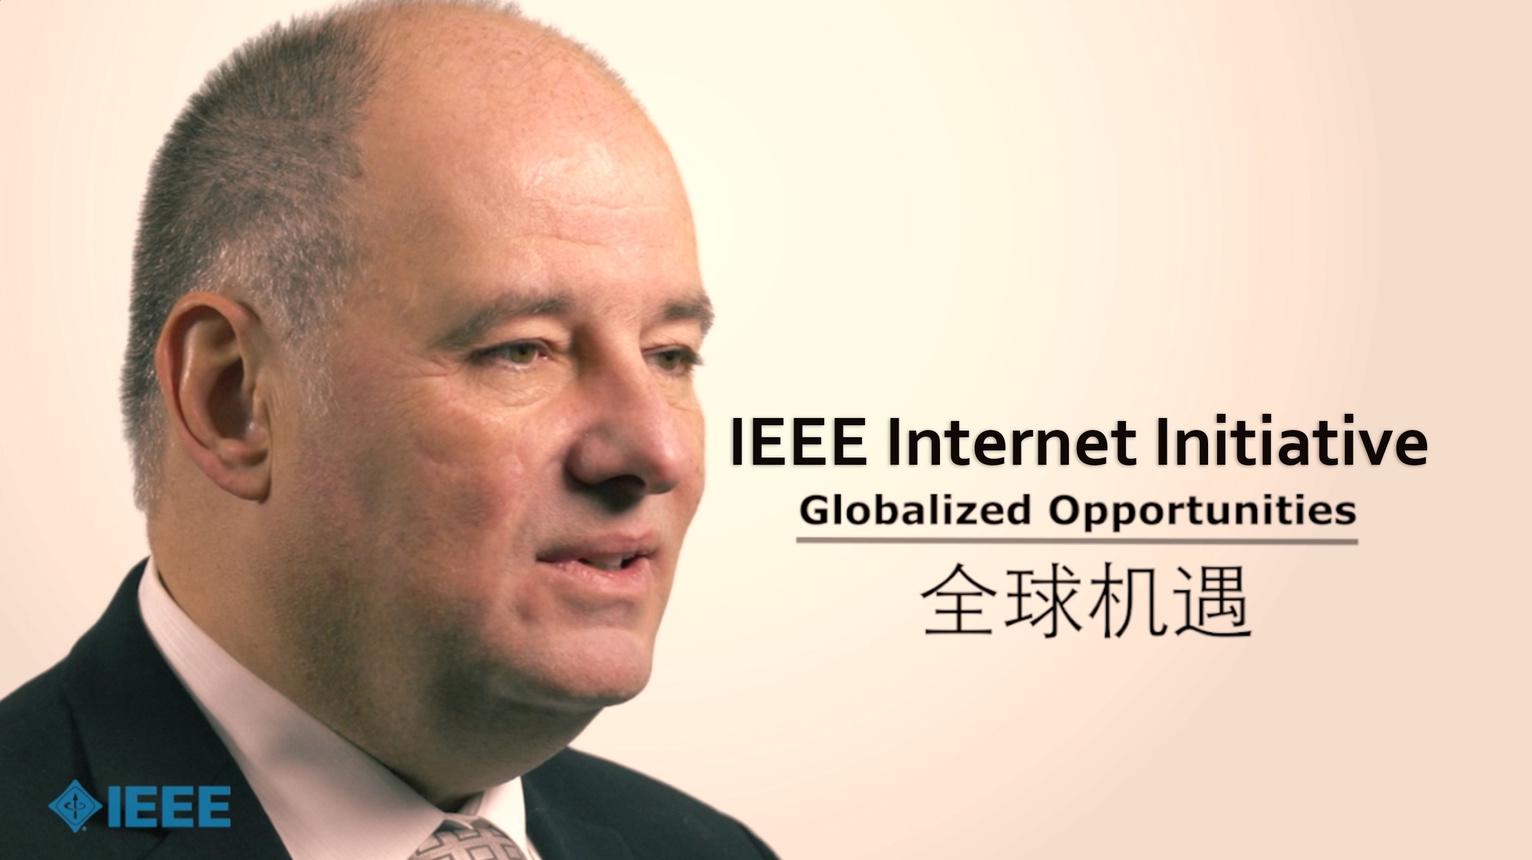 IEEE Internet Initiative